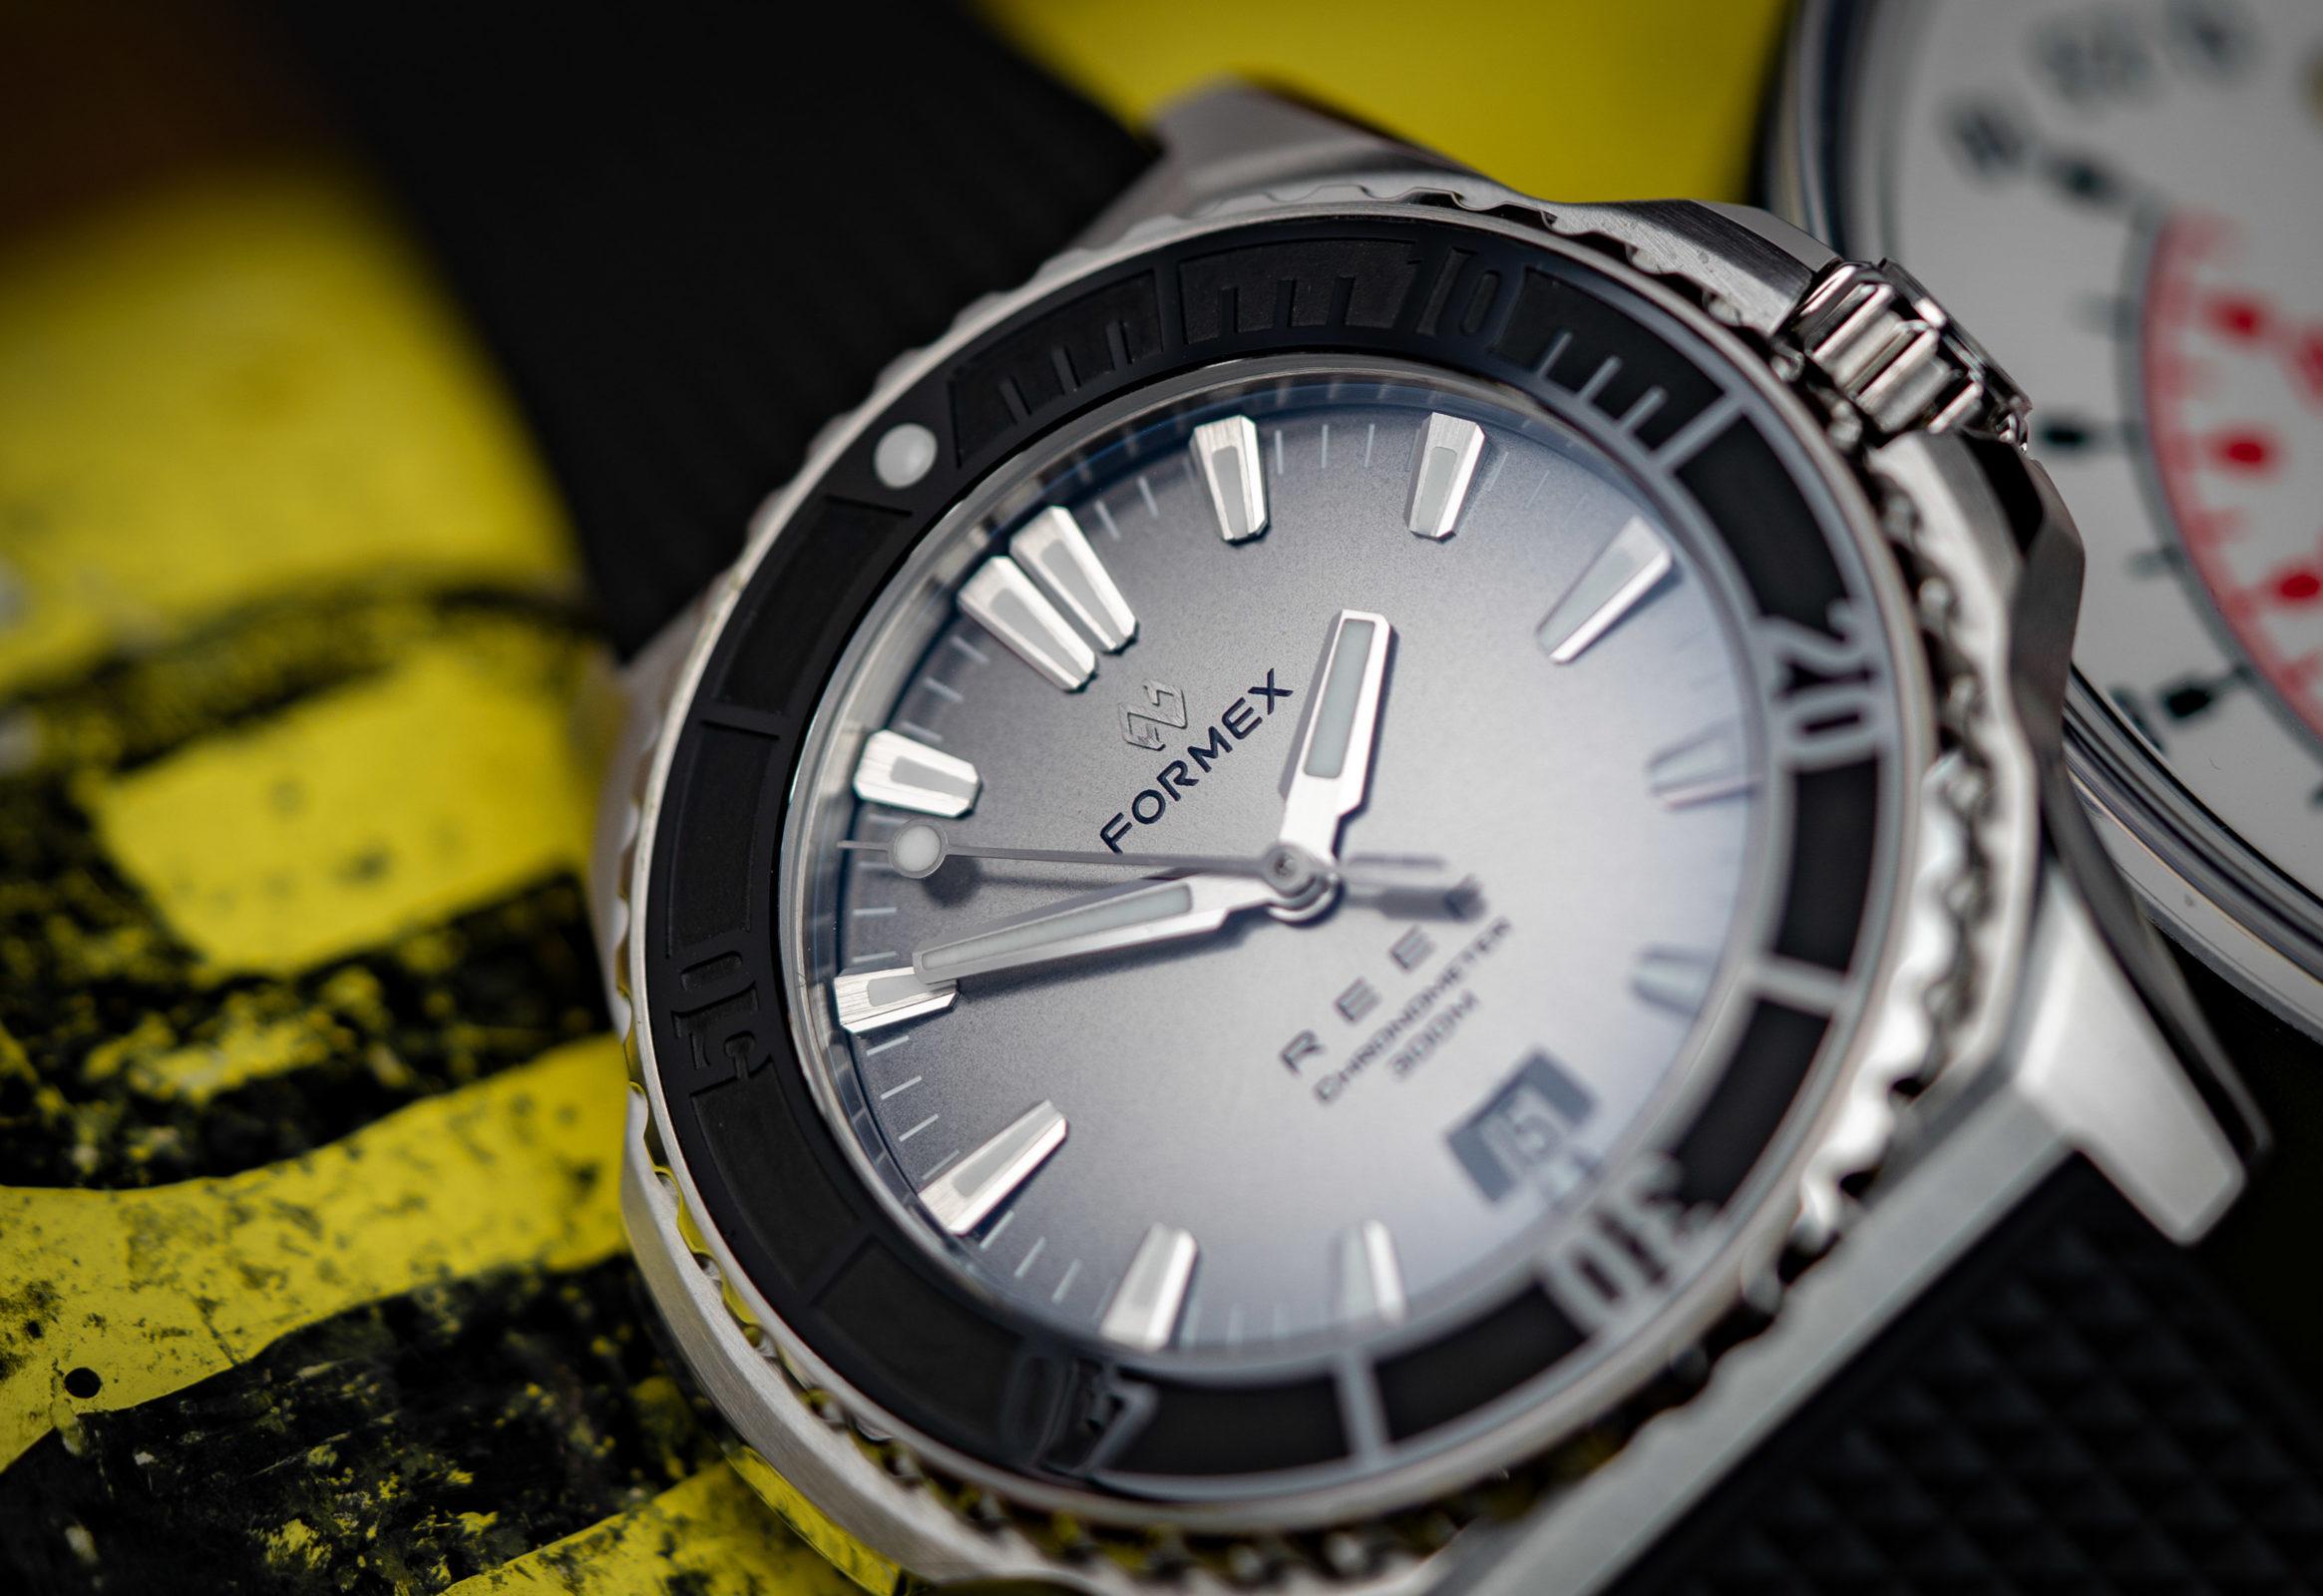 Formex-Reef-Automatik-Chronometer-300m-29